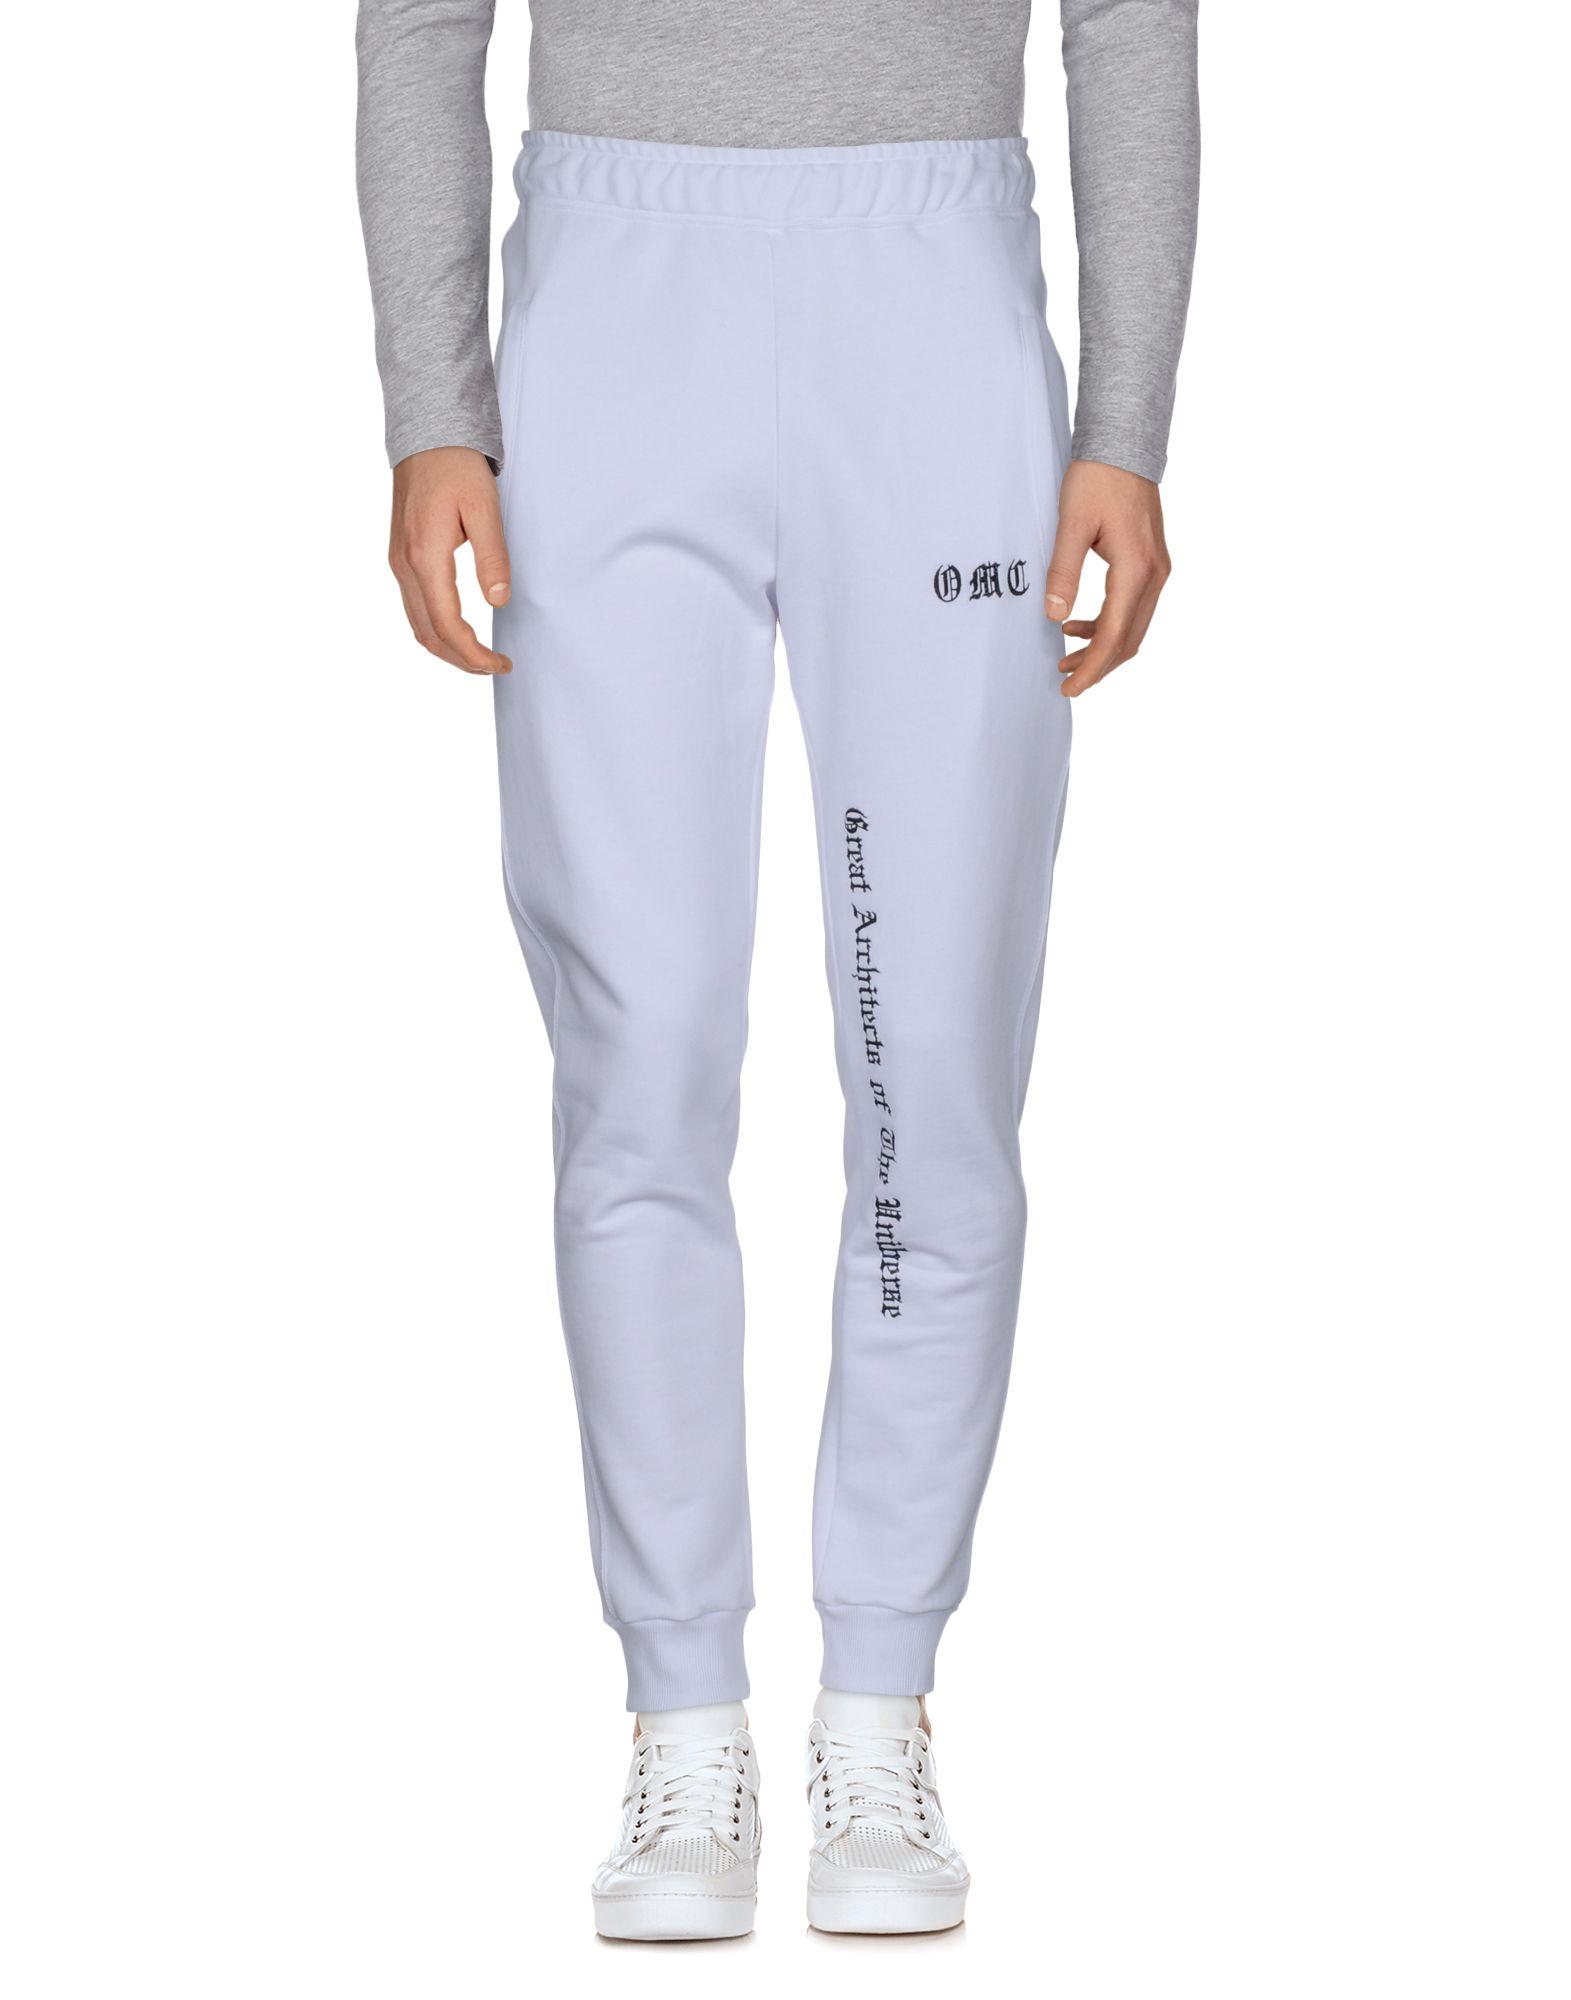 Men s sweatpants  designer fleece joggers, skinny sweat pants   more   YOOX 0f257fbd98f